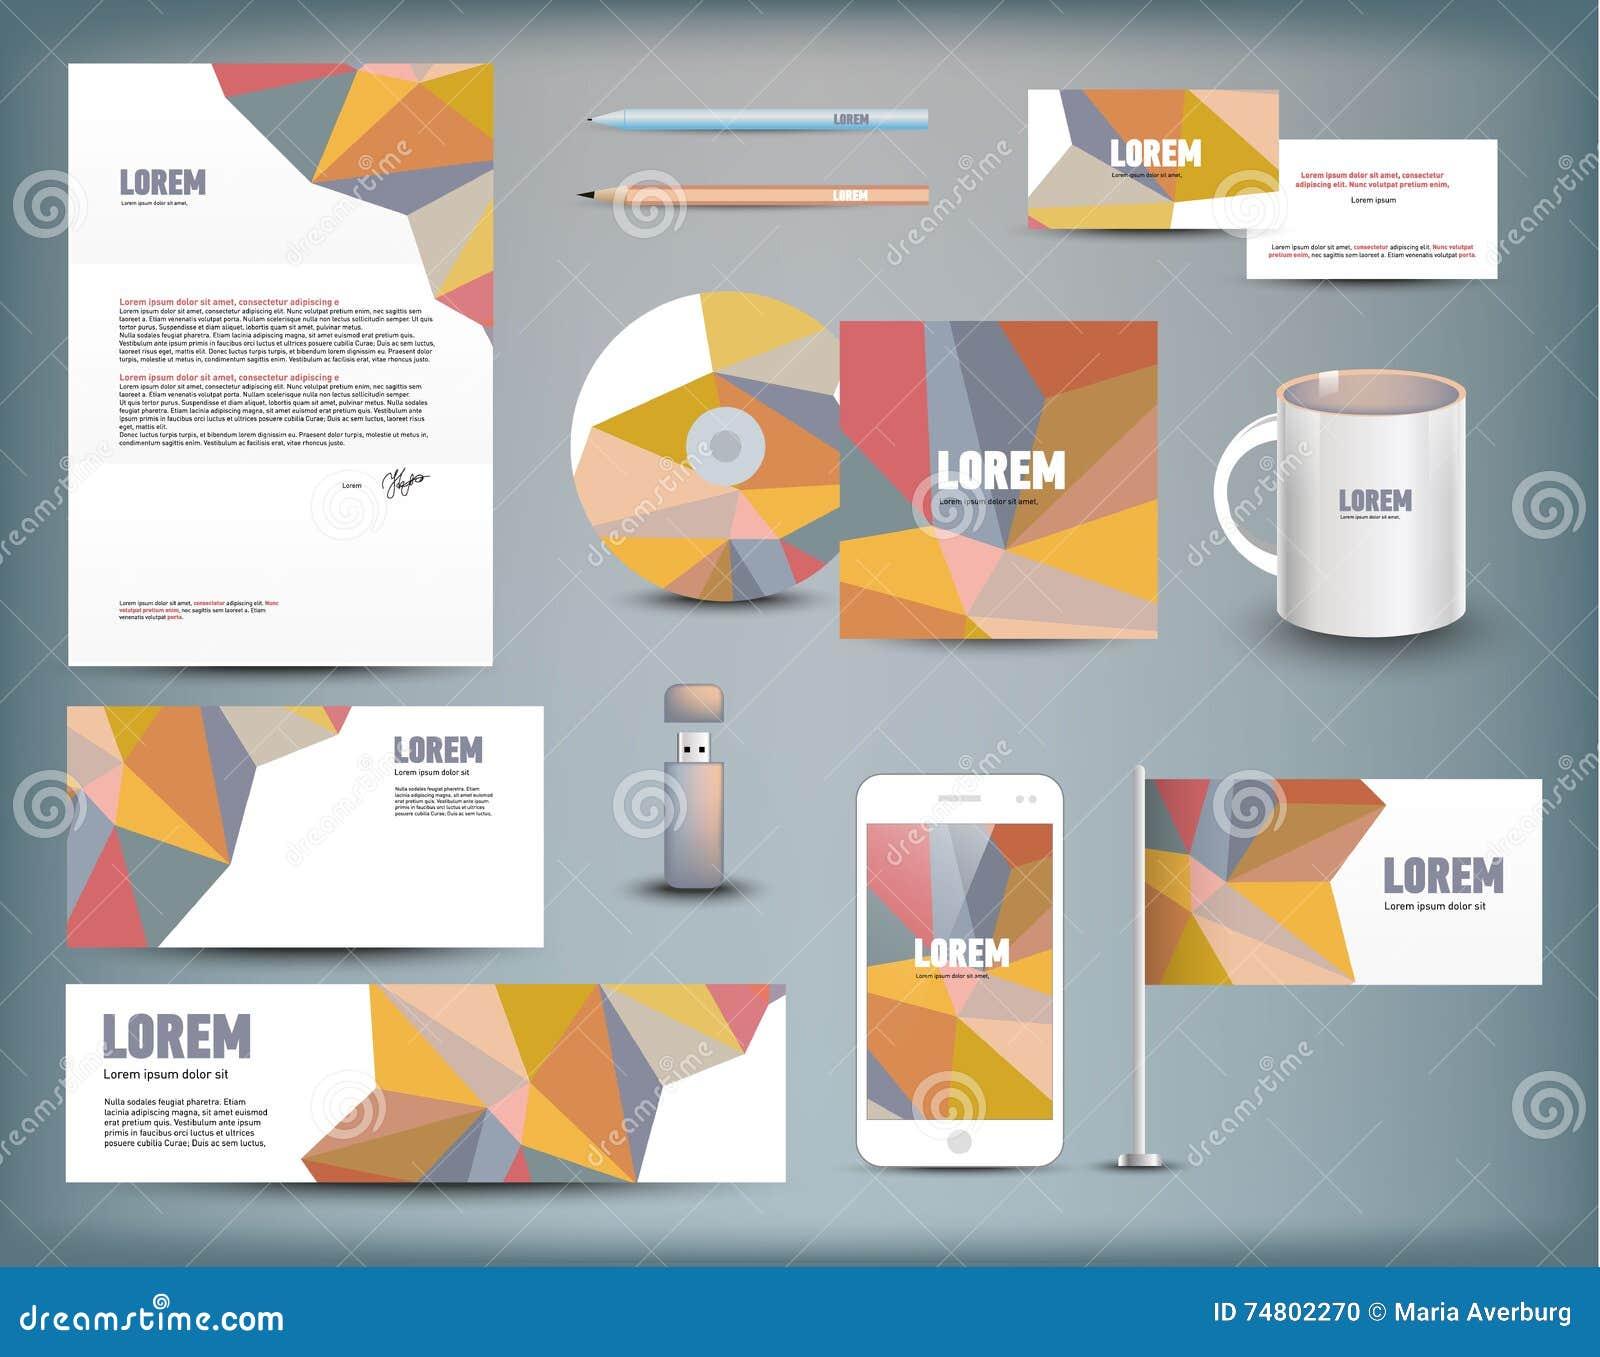 corporate identity templates stock vector image 74802270